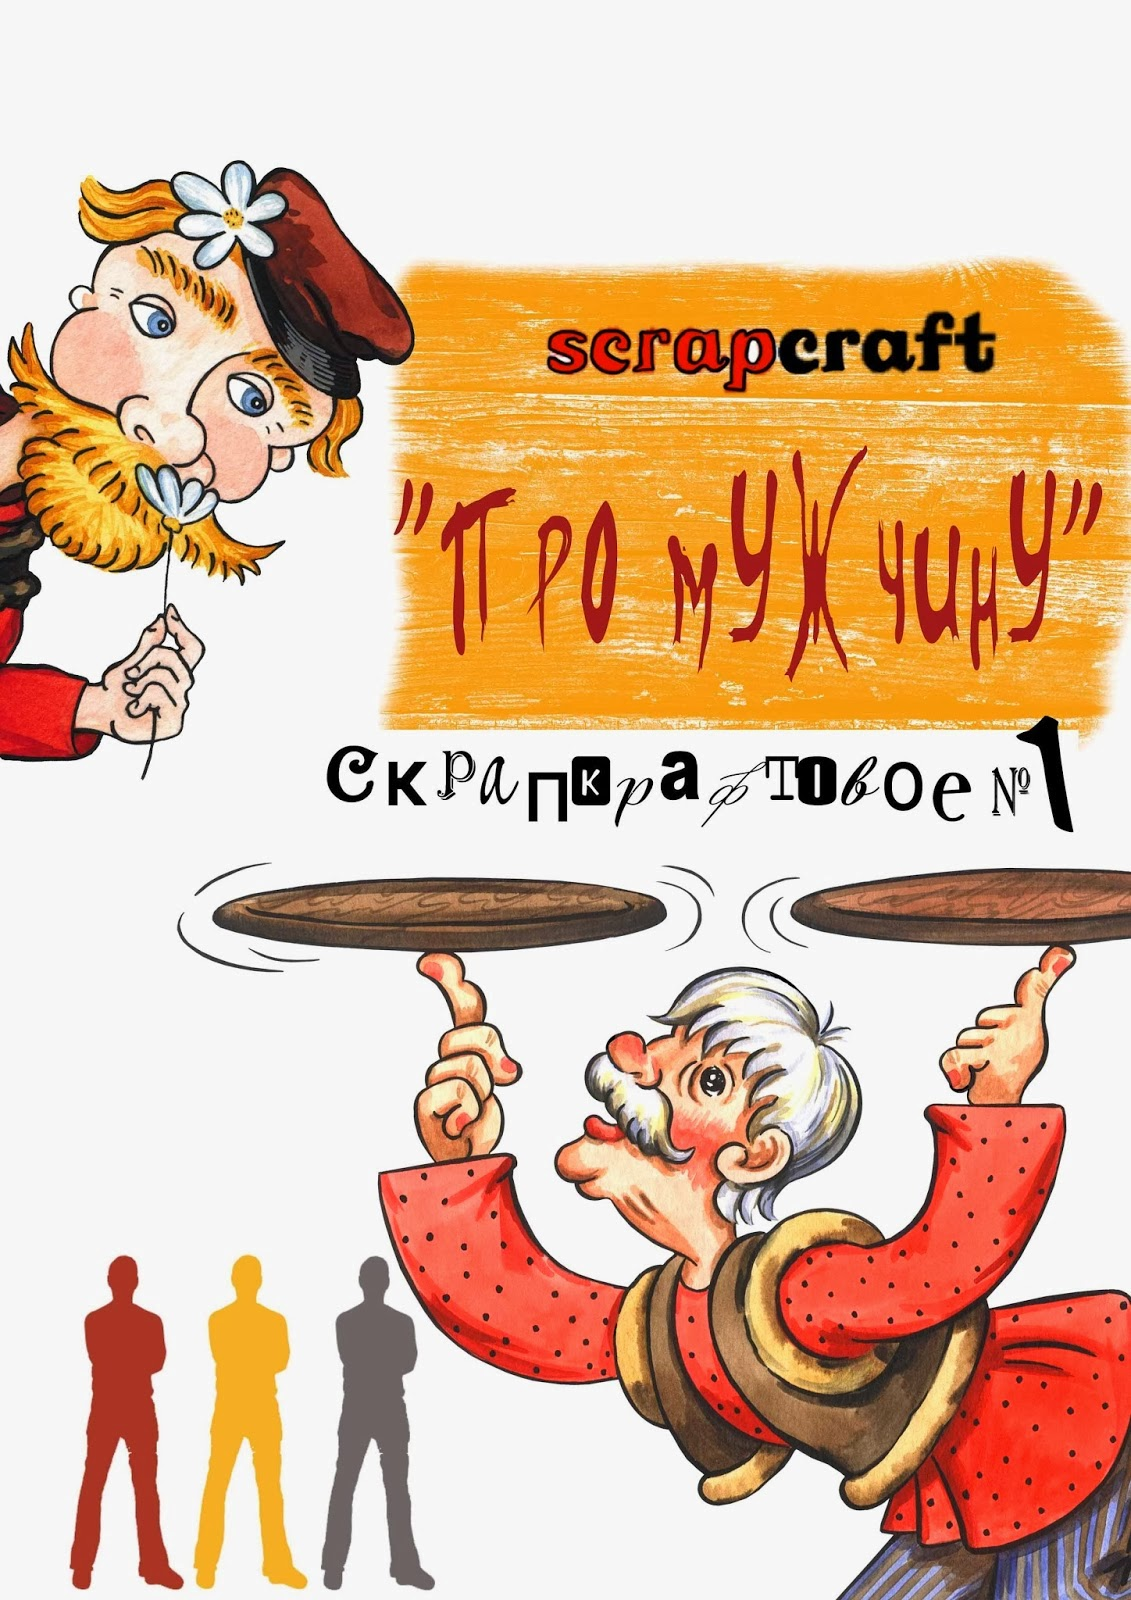 http://scrapcraft-ru.blogspot.ru/2014/02/blog-post_13.html